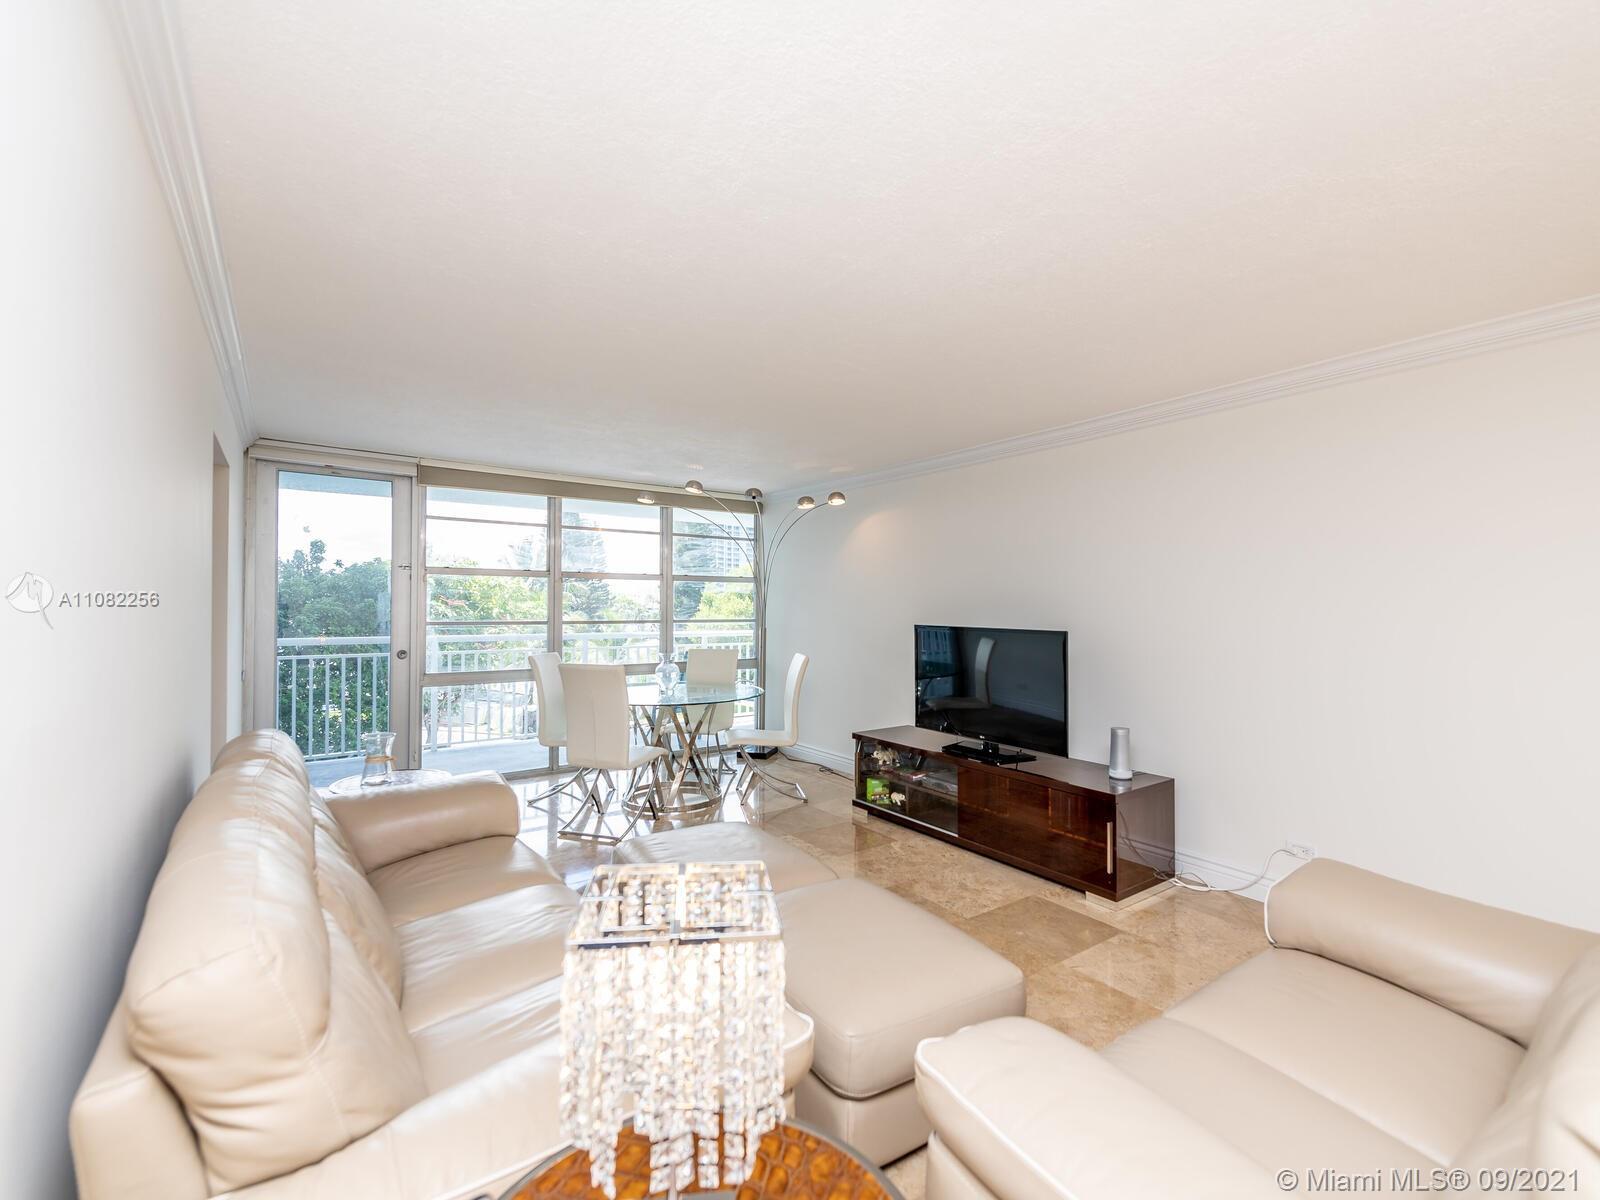 Winston Tower 500 #320 - 301 174th St #320, Sunny Isles Beach, FL 33160